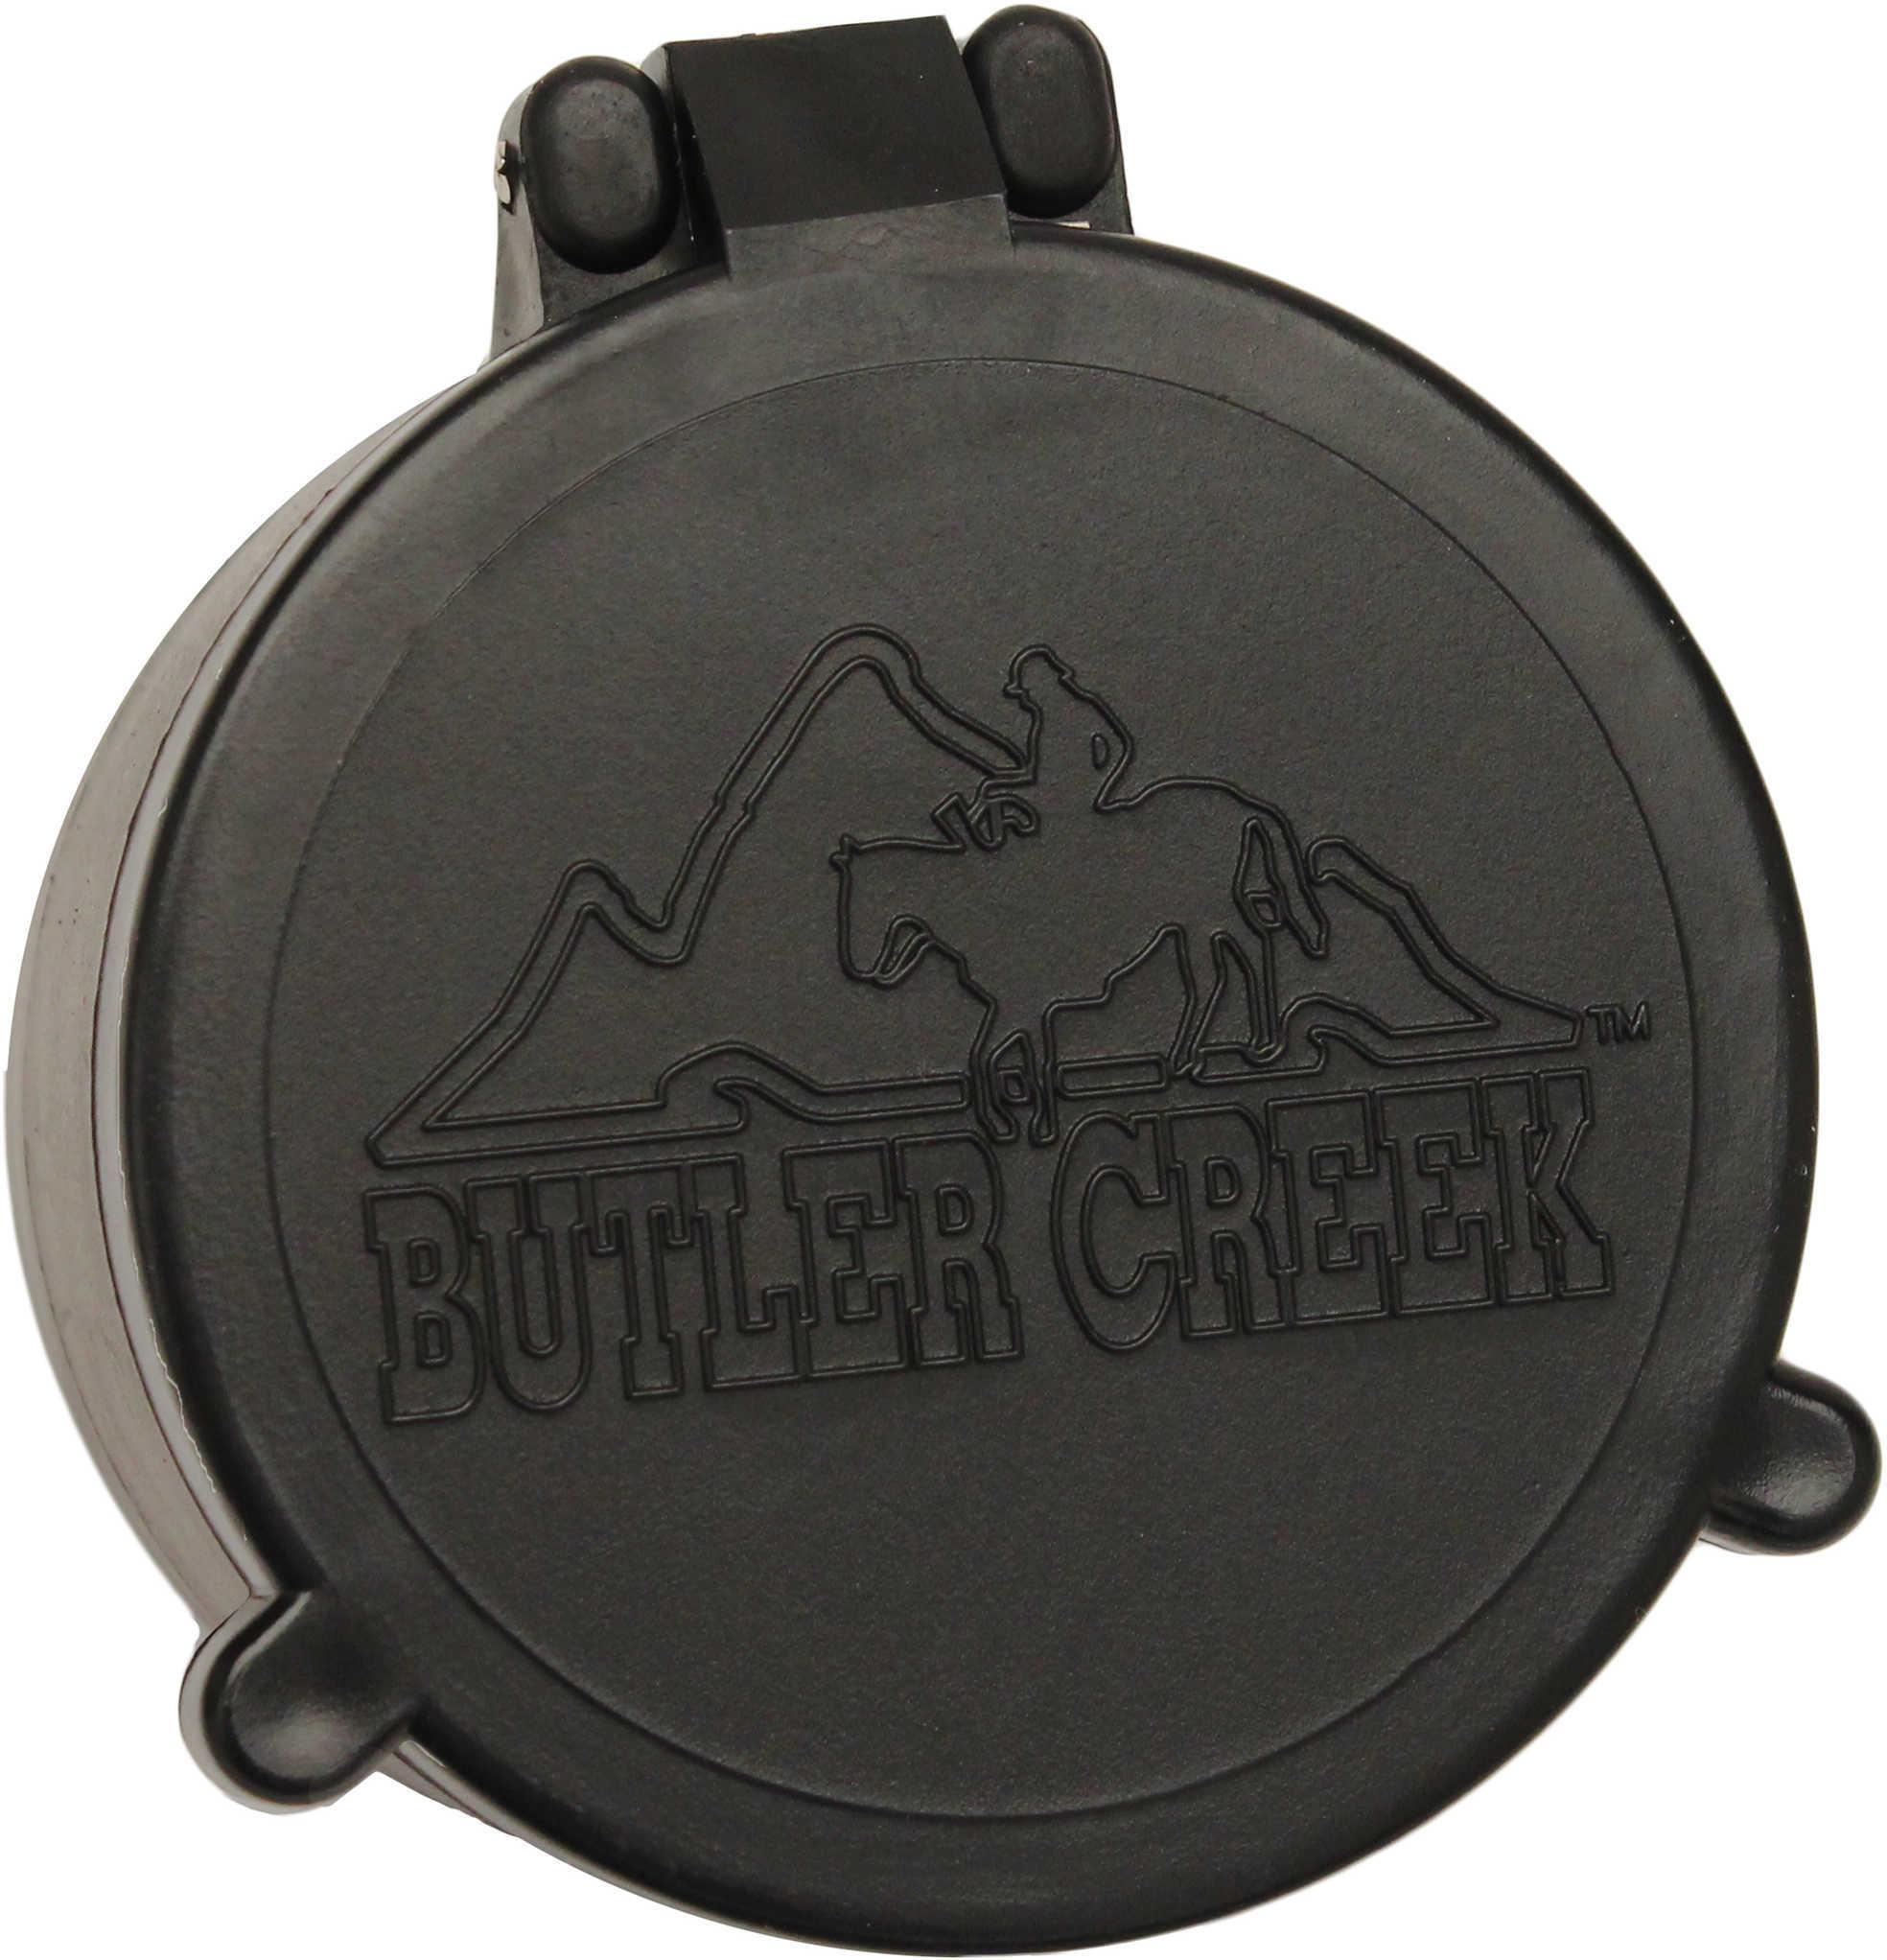 Butler Creek Flip Open Scope Cover - Objective Size 07 Md: 30070